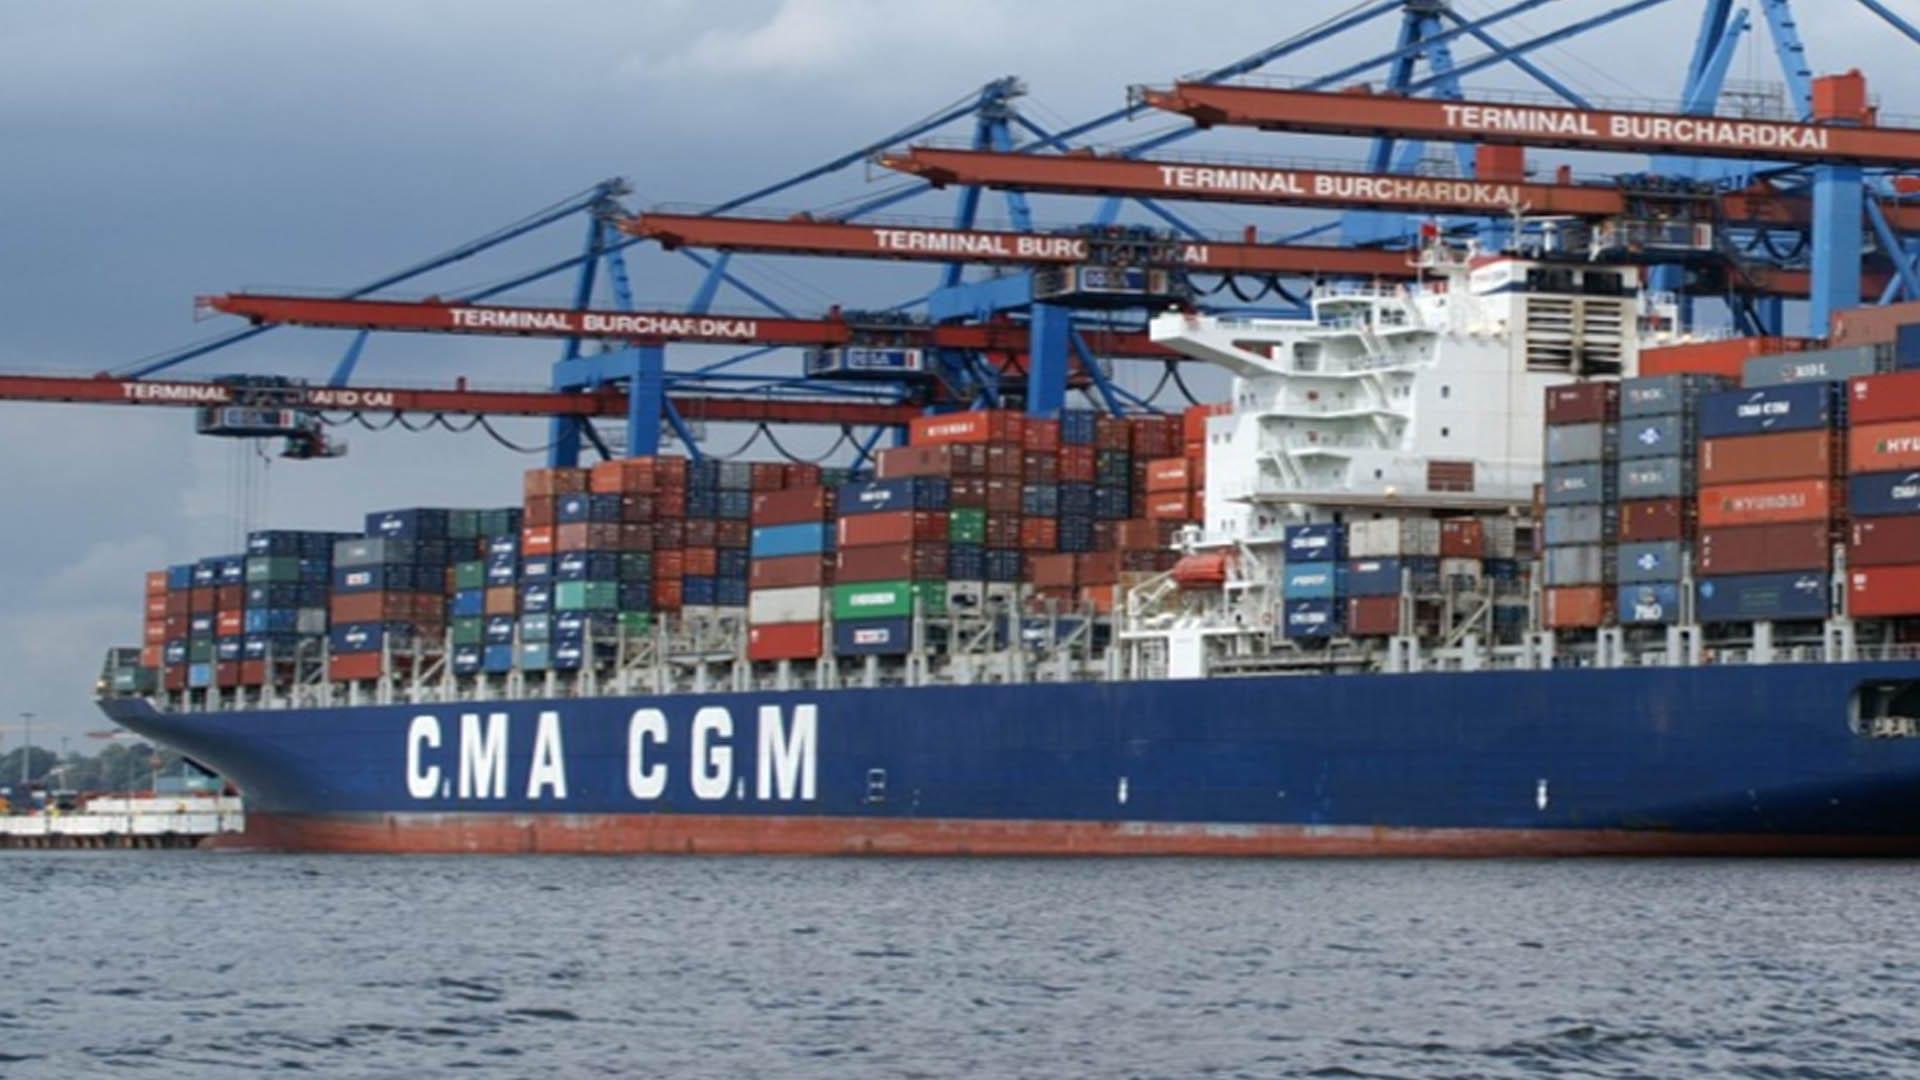 CMA CGM Raising USD 2 Bn through Sale of Vessels, Terminal Stakes